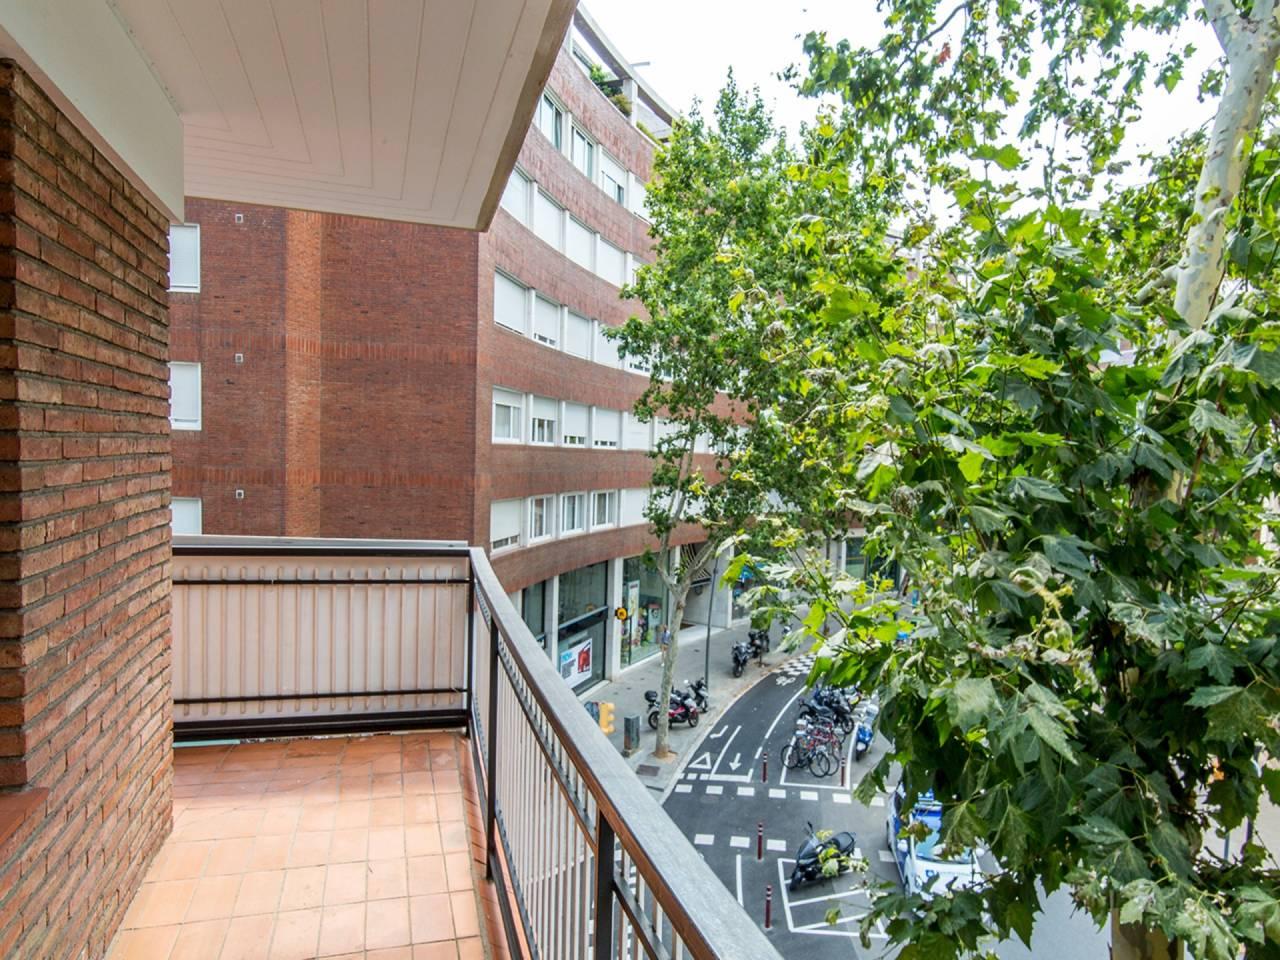 Lloguer Pis  Calle ganduxer, 34. Exclusivo piso en alquiler de 140m² más 2 terrazas de 5m² y 15m²